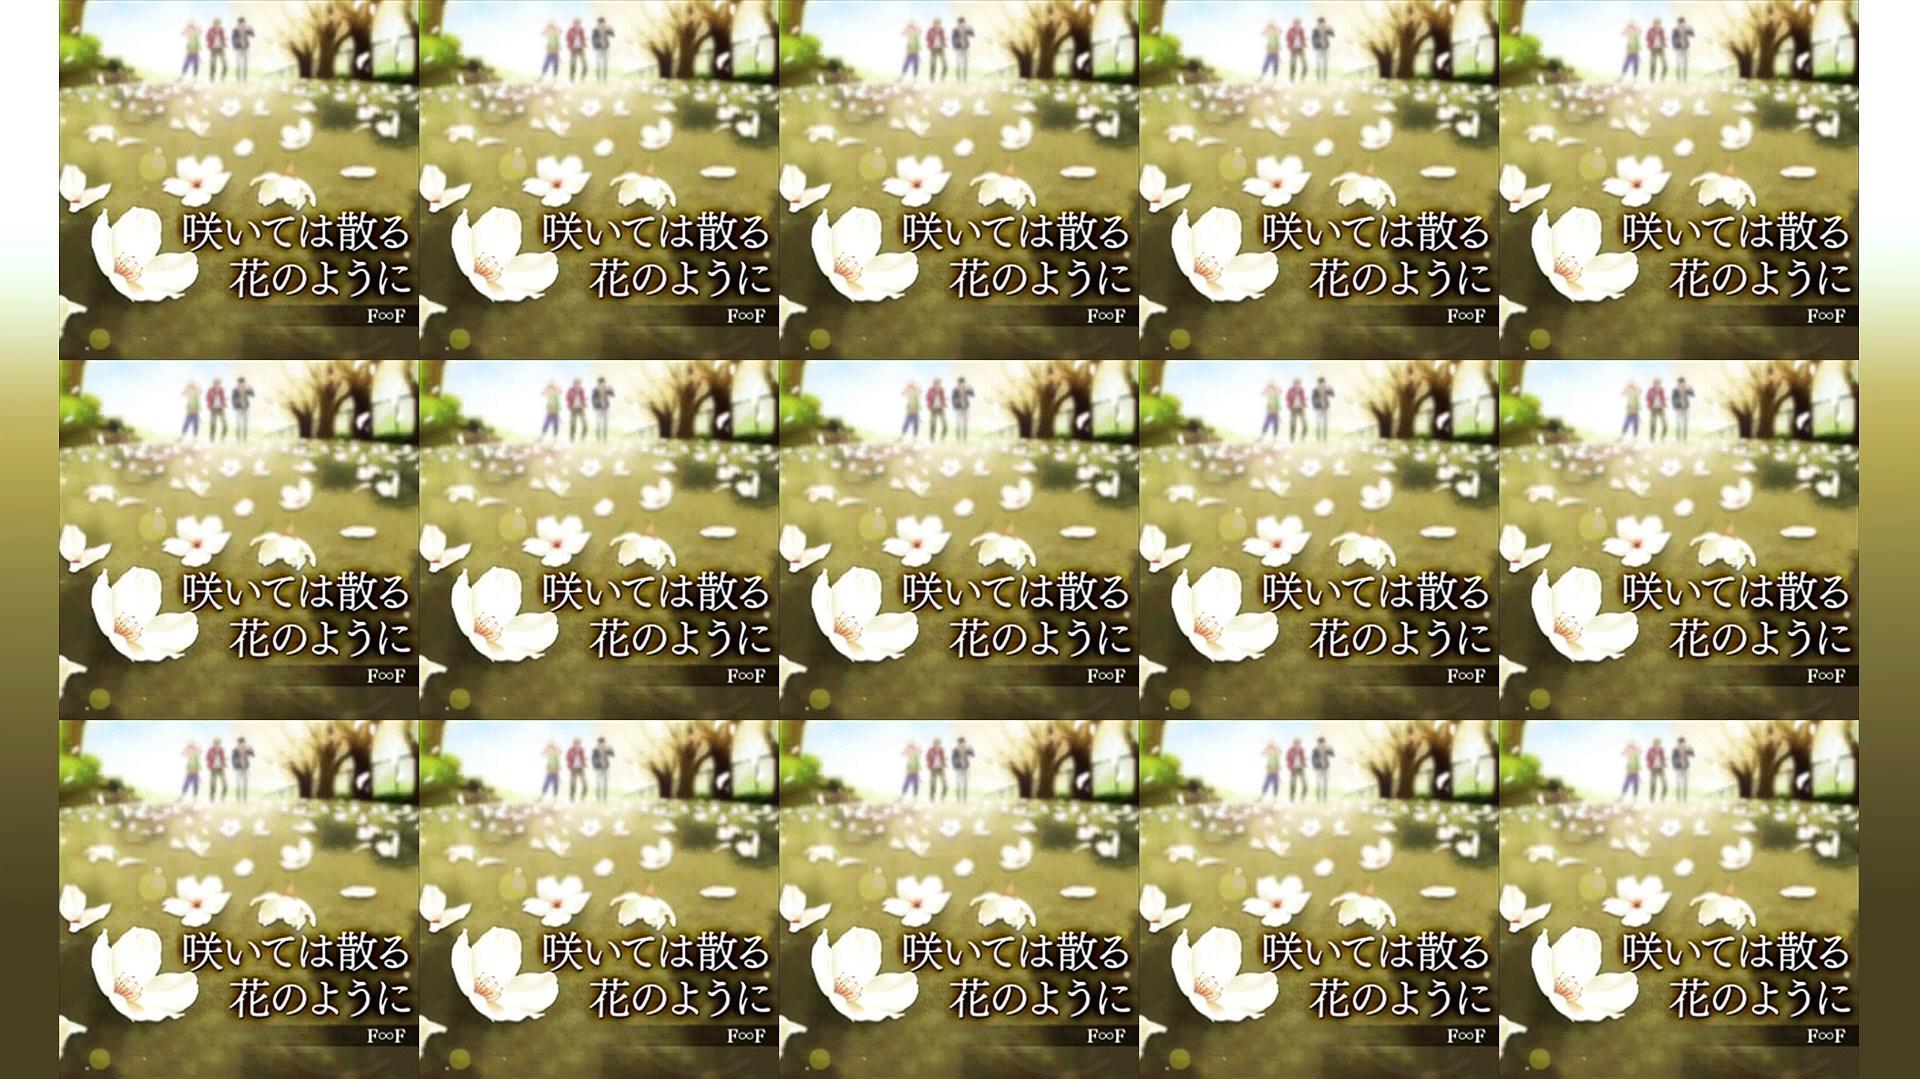 Saite wa Chiru Hana no Youni (咲いては散る花のように) - F∞F